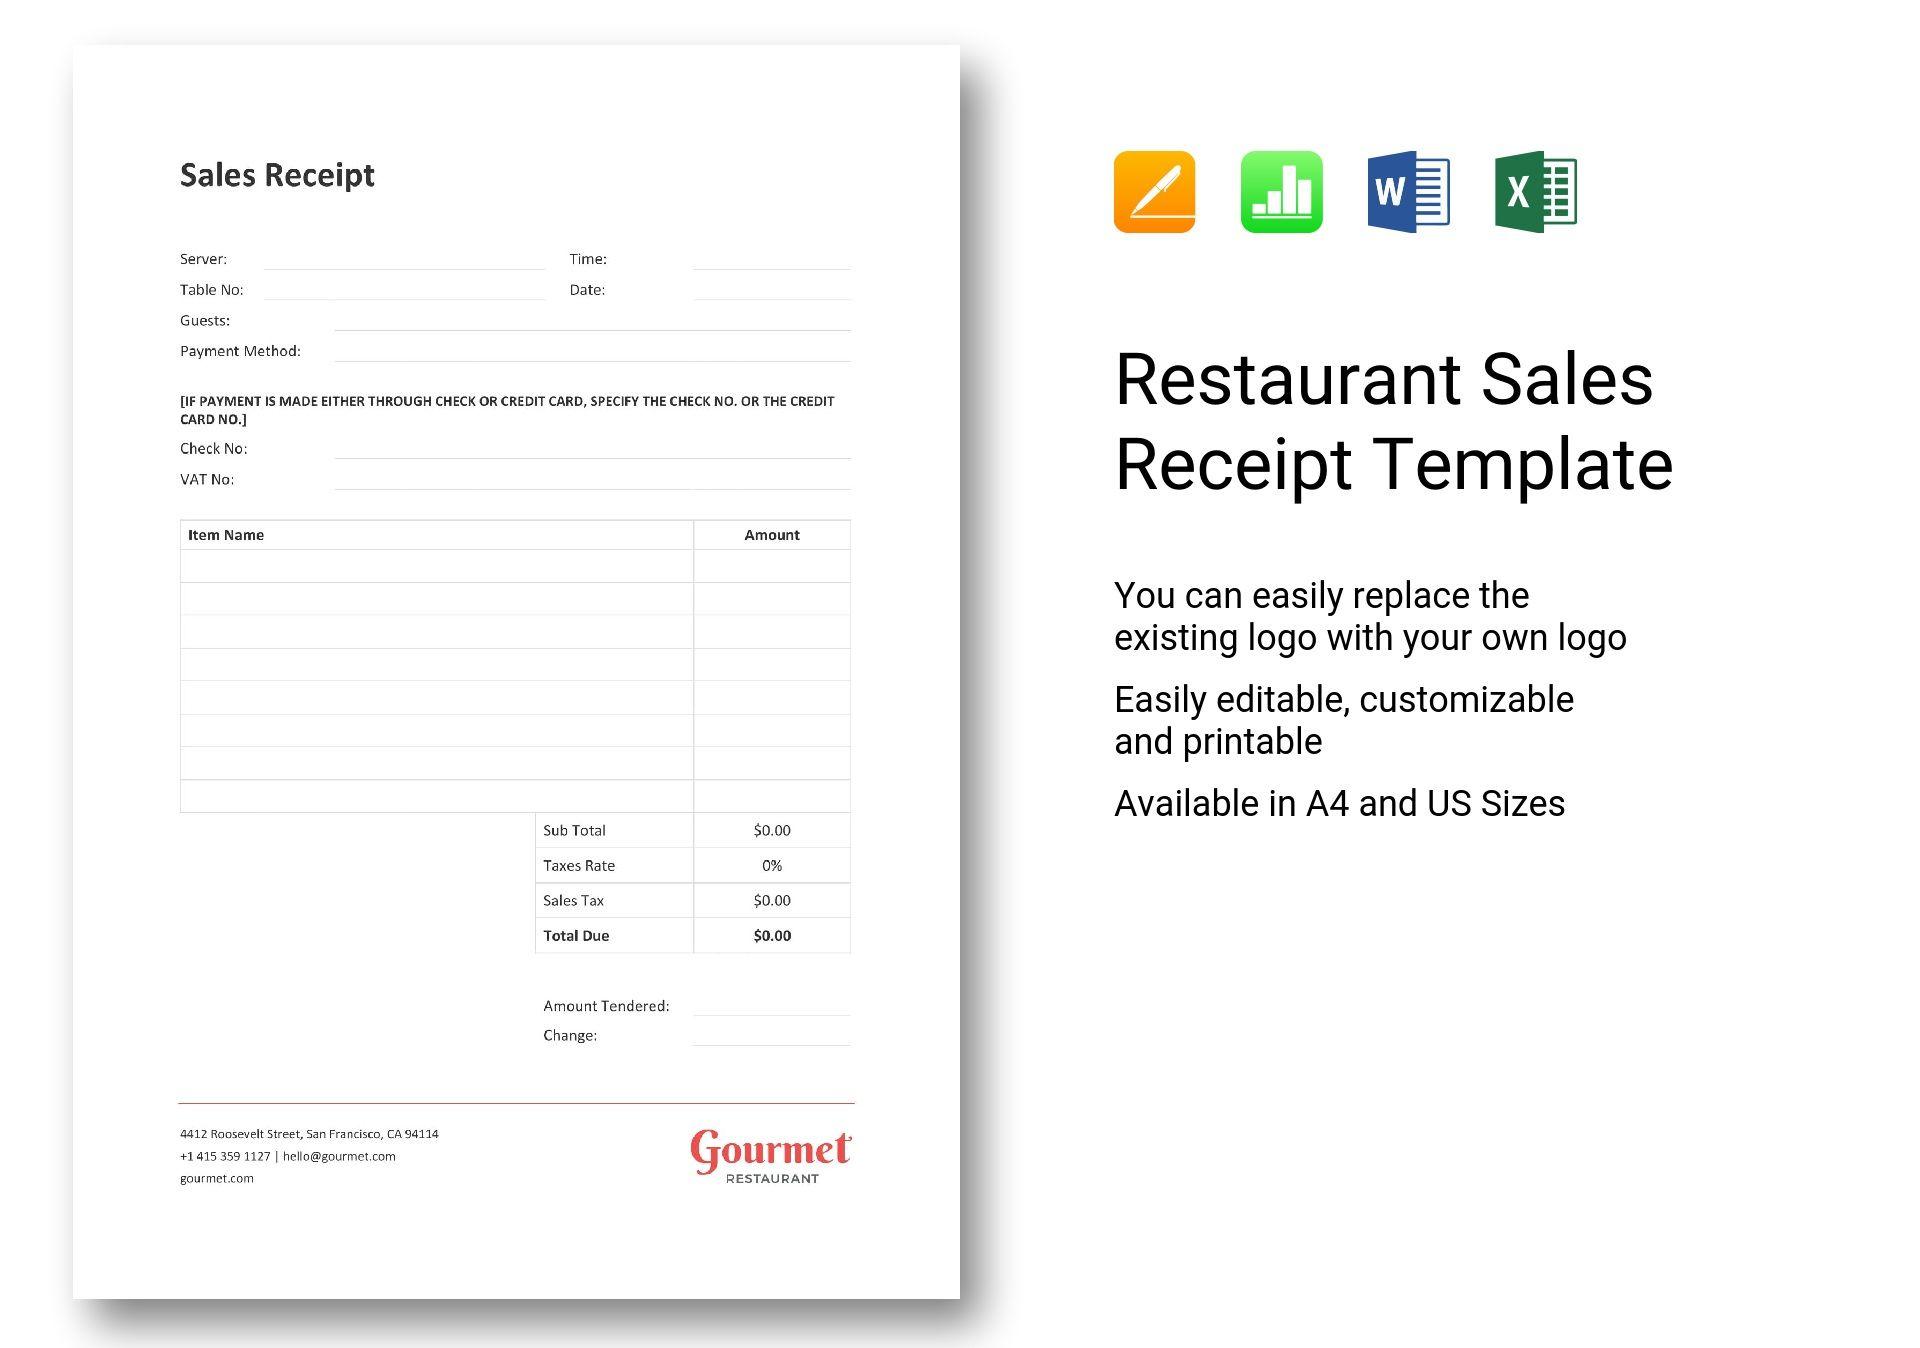 Restaurant Sales Receipt Template In Word Excel Apple